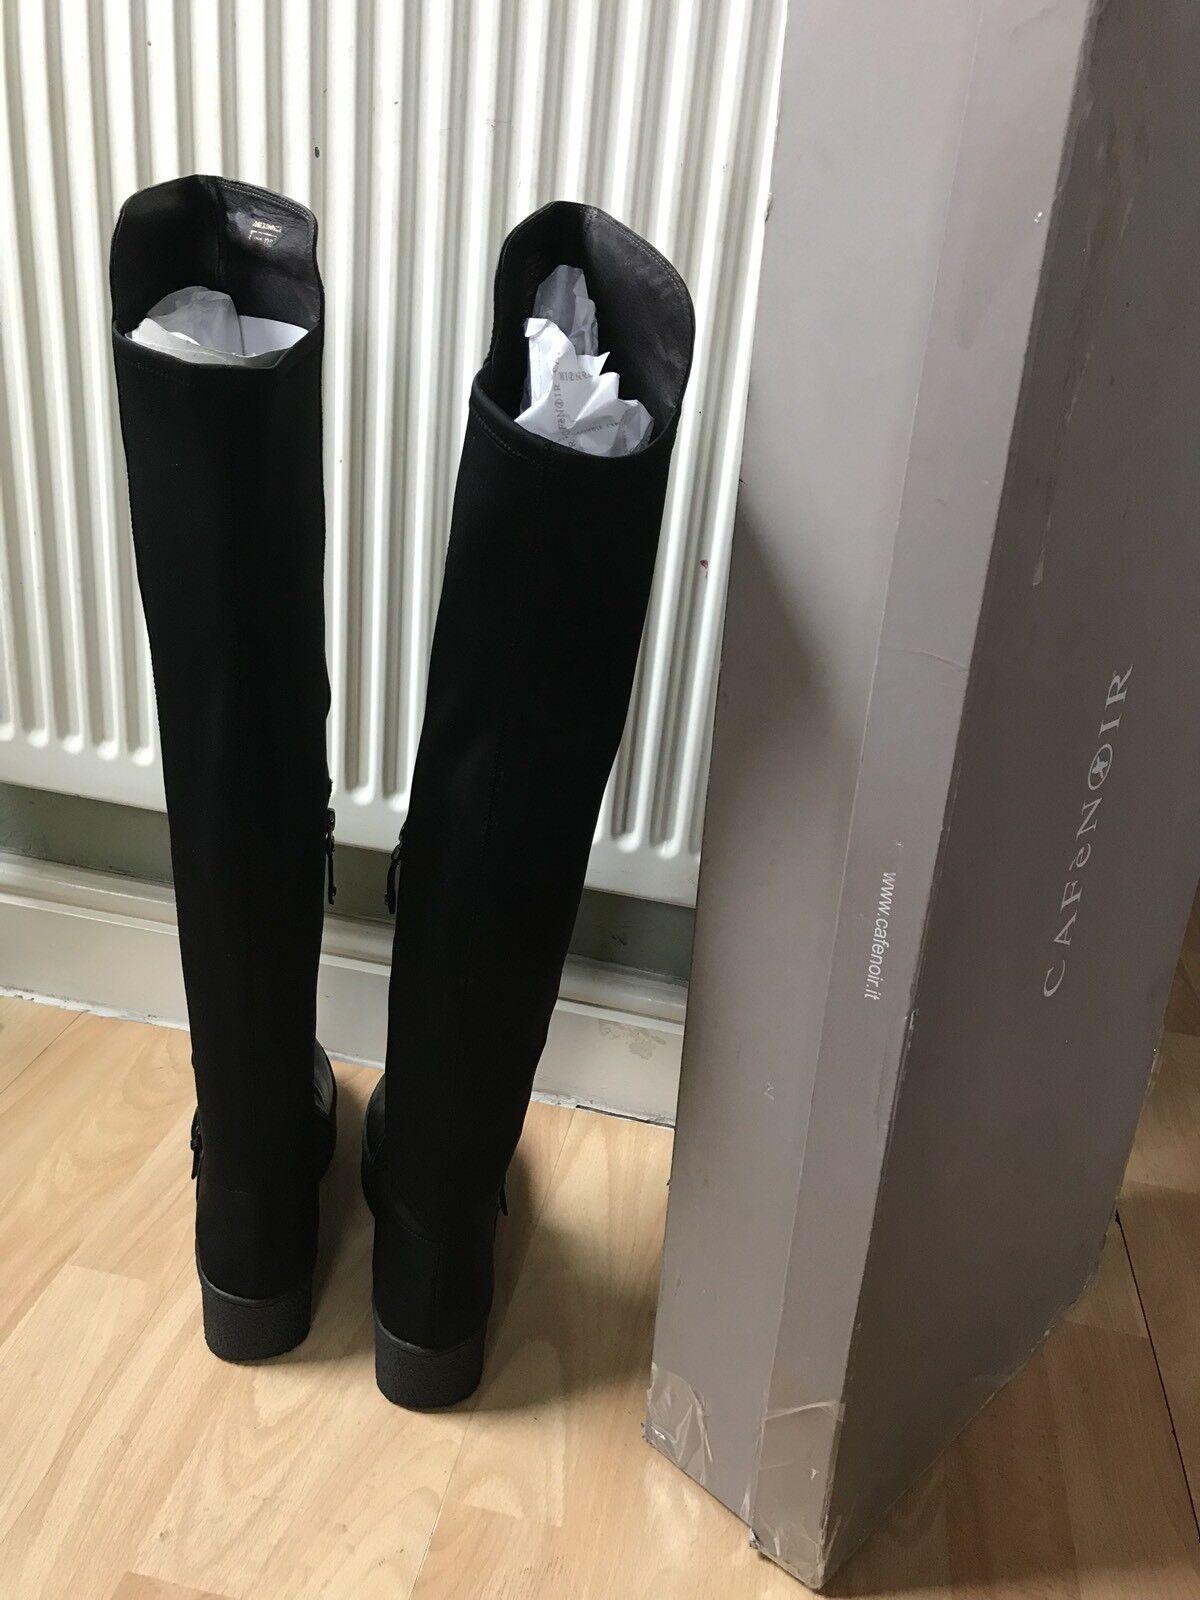 Zapatos especiales con descuento CAFeNOIR Women's Leather+Elastane Boots Size 38, Look All Photos Please